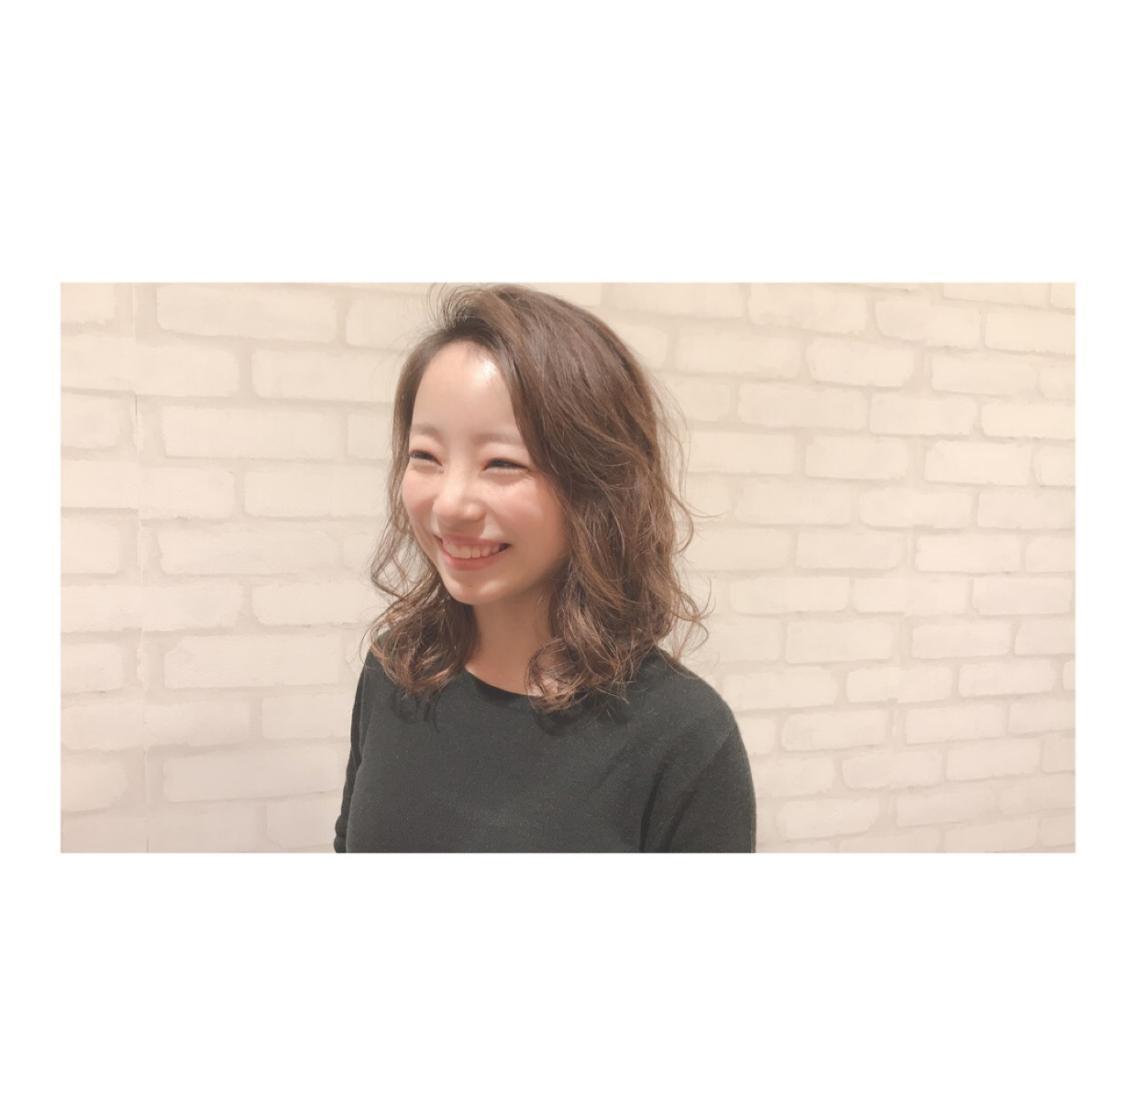 ⚠️営業時間外⚠️7月限定❣️カラー・パーマ・縮毛矯正モデル募集中❣️(15時からも要相談)